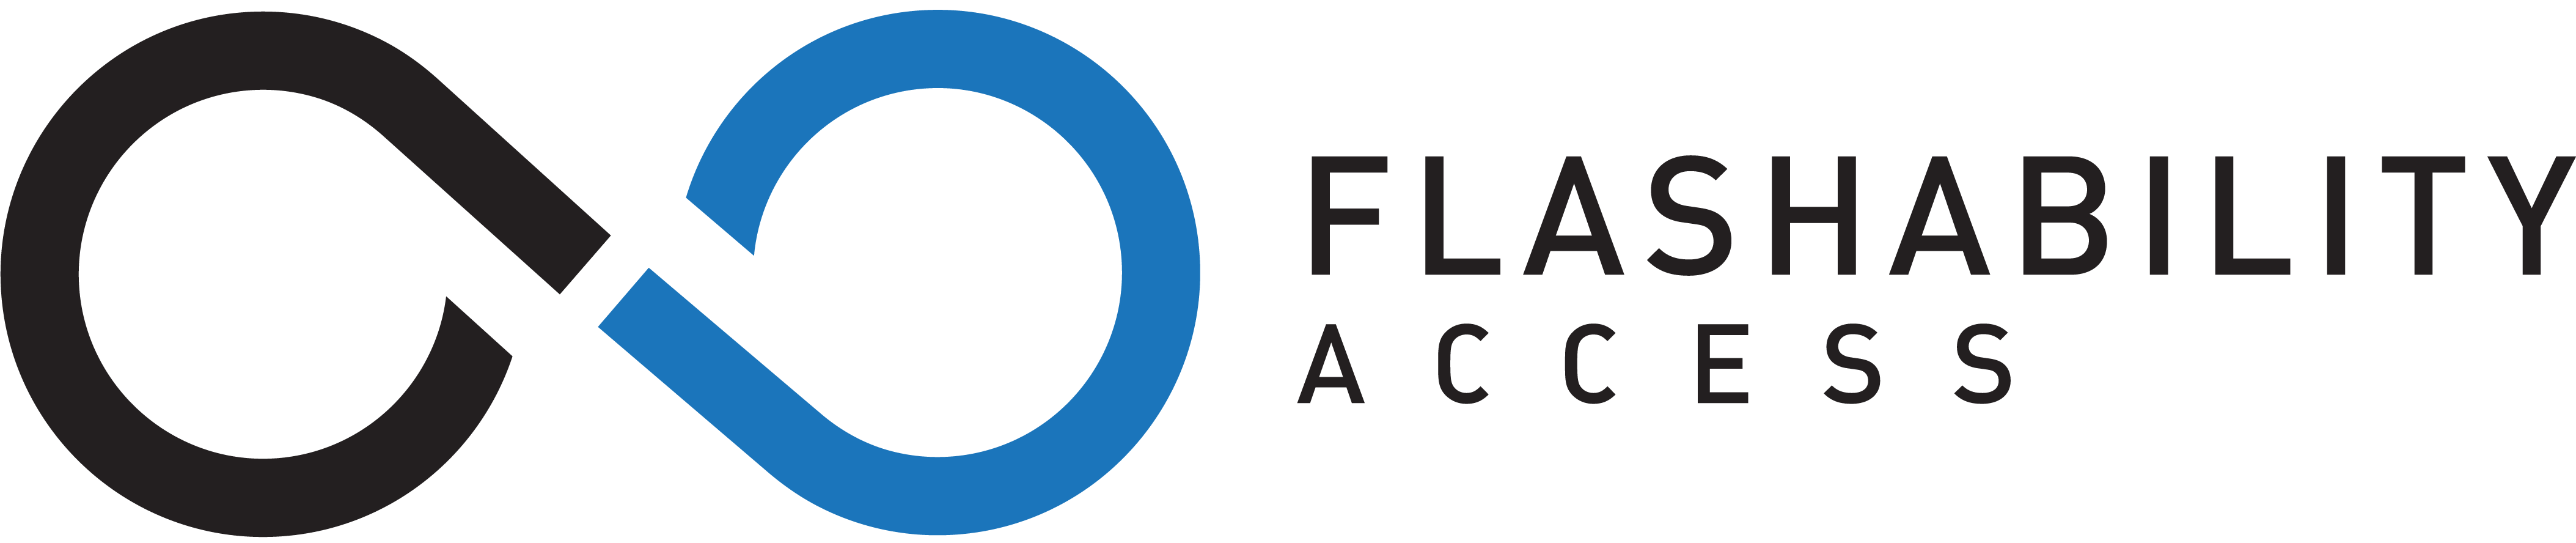 FlashAbility Access